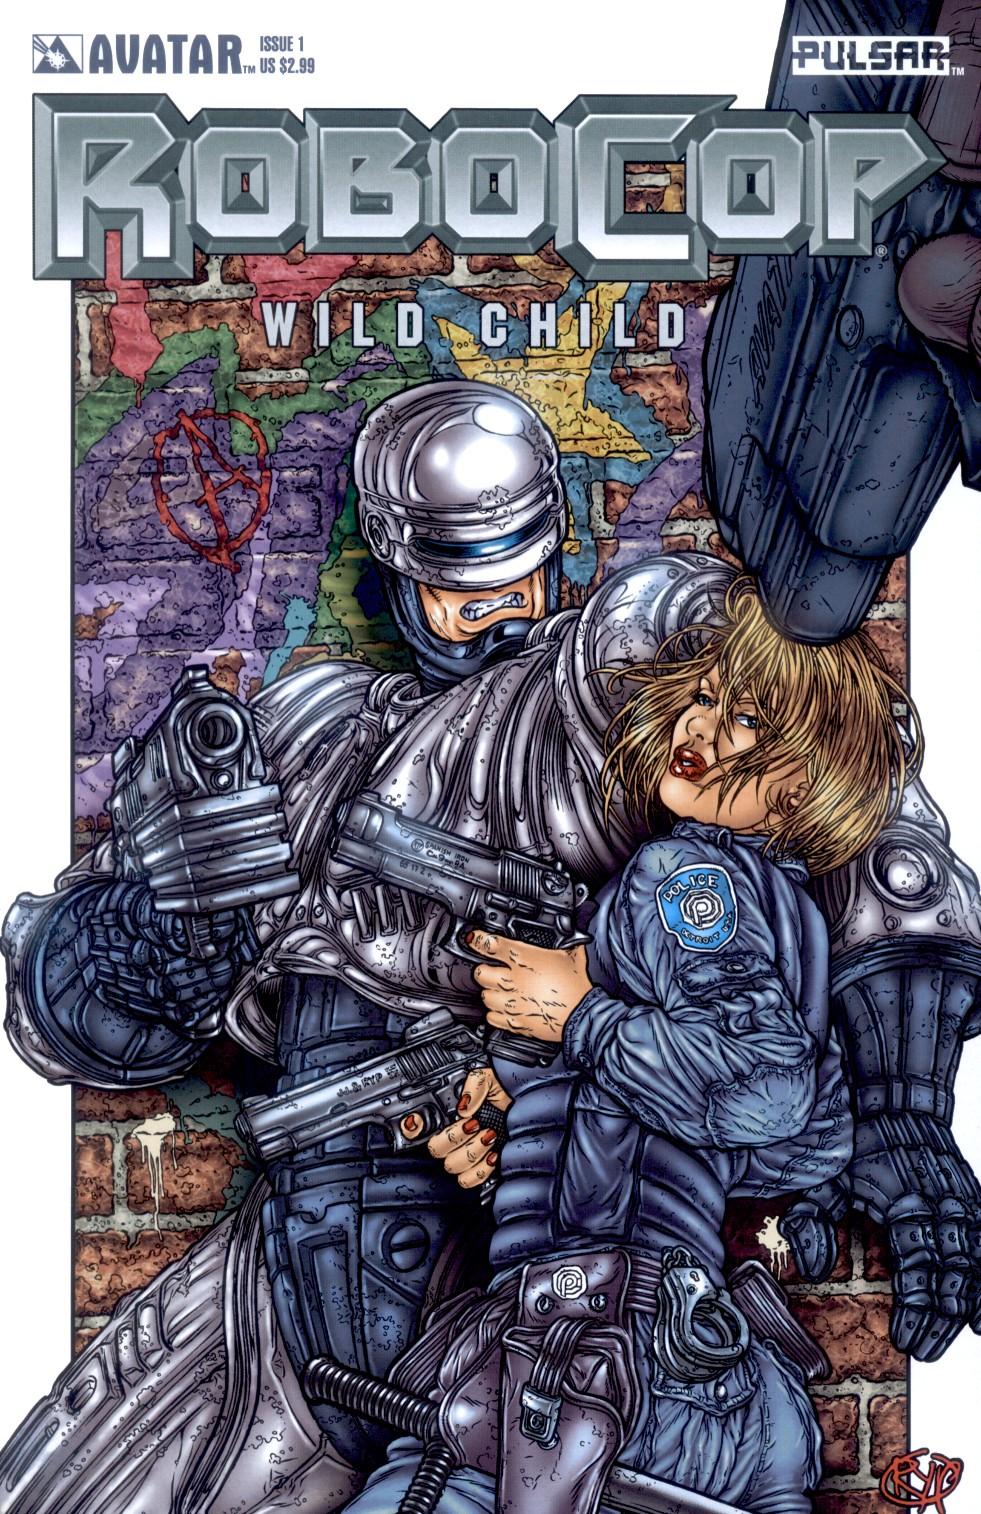 Read online Robocop: Wild Child comic -  Issue # Full - 1